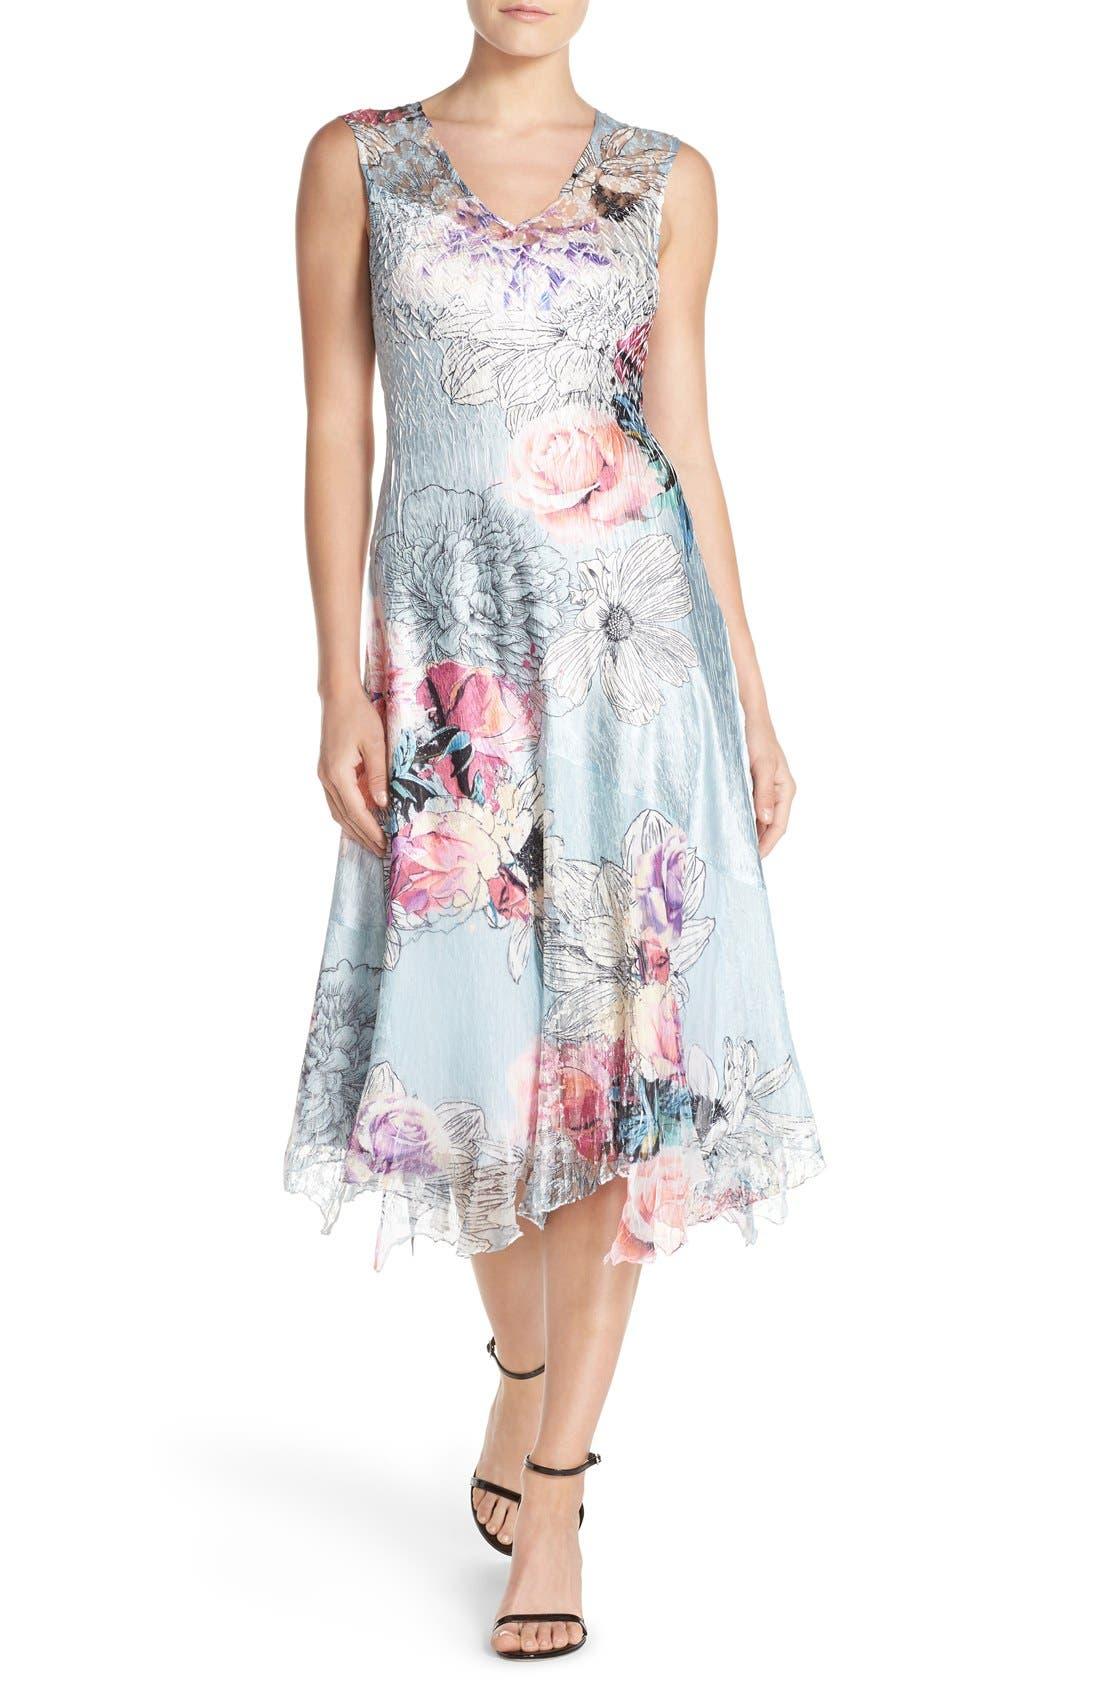 Alternate Image 1 Selected - Komarov Mixed Media Midi Dress (Regular & Petite)